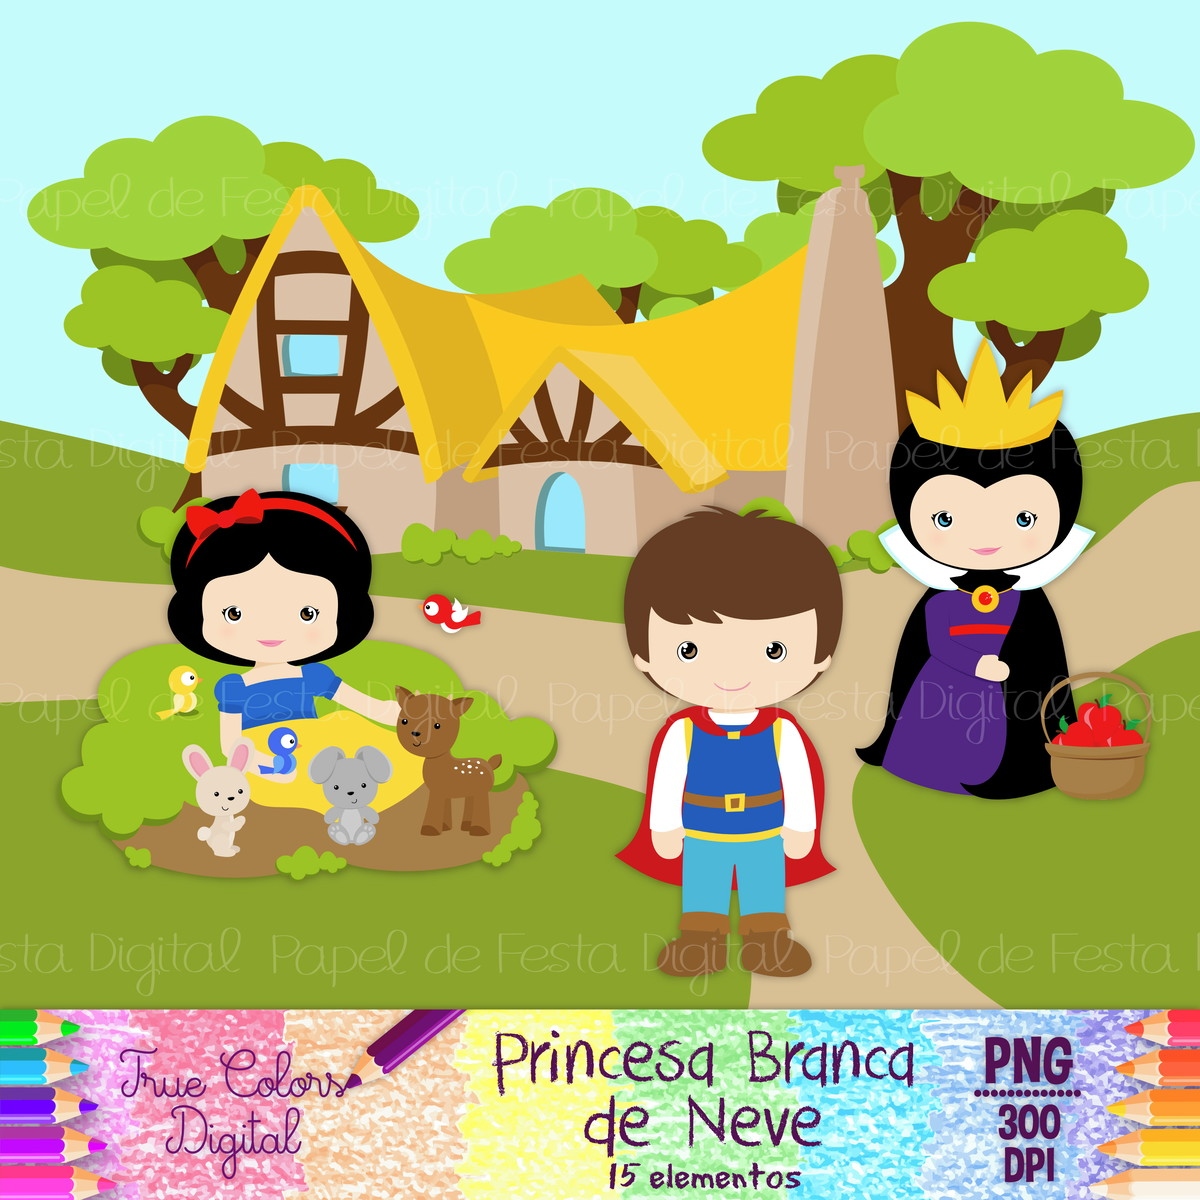 Kit Digital Princesa Branca De Neve No Elo7 True Colors Digital